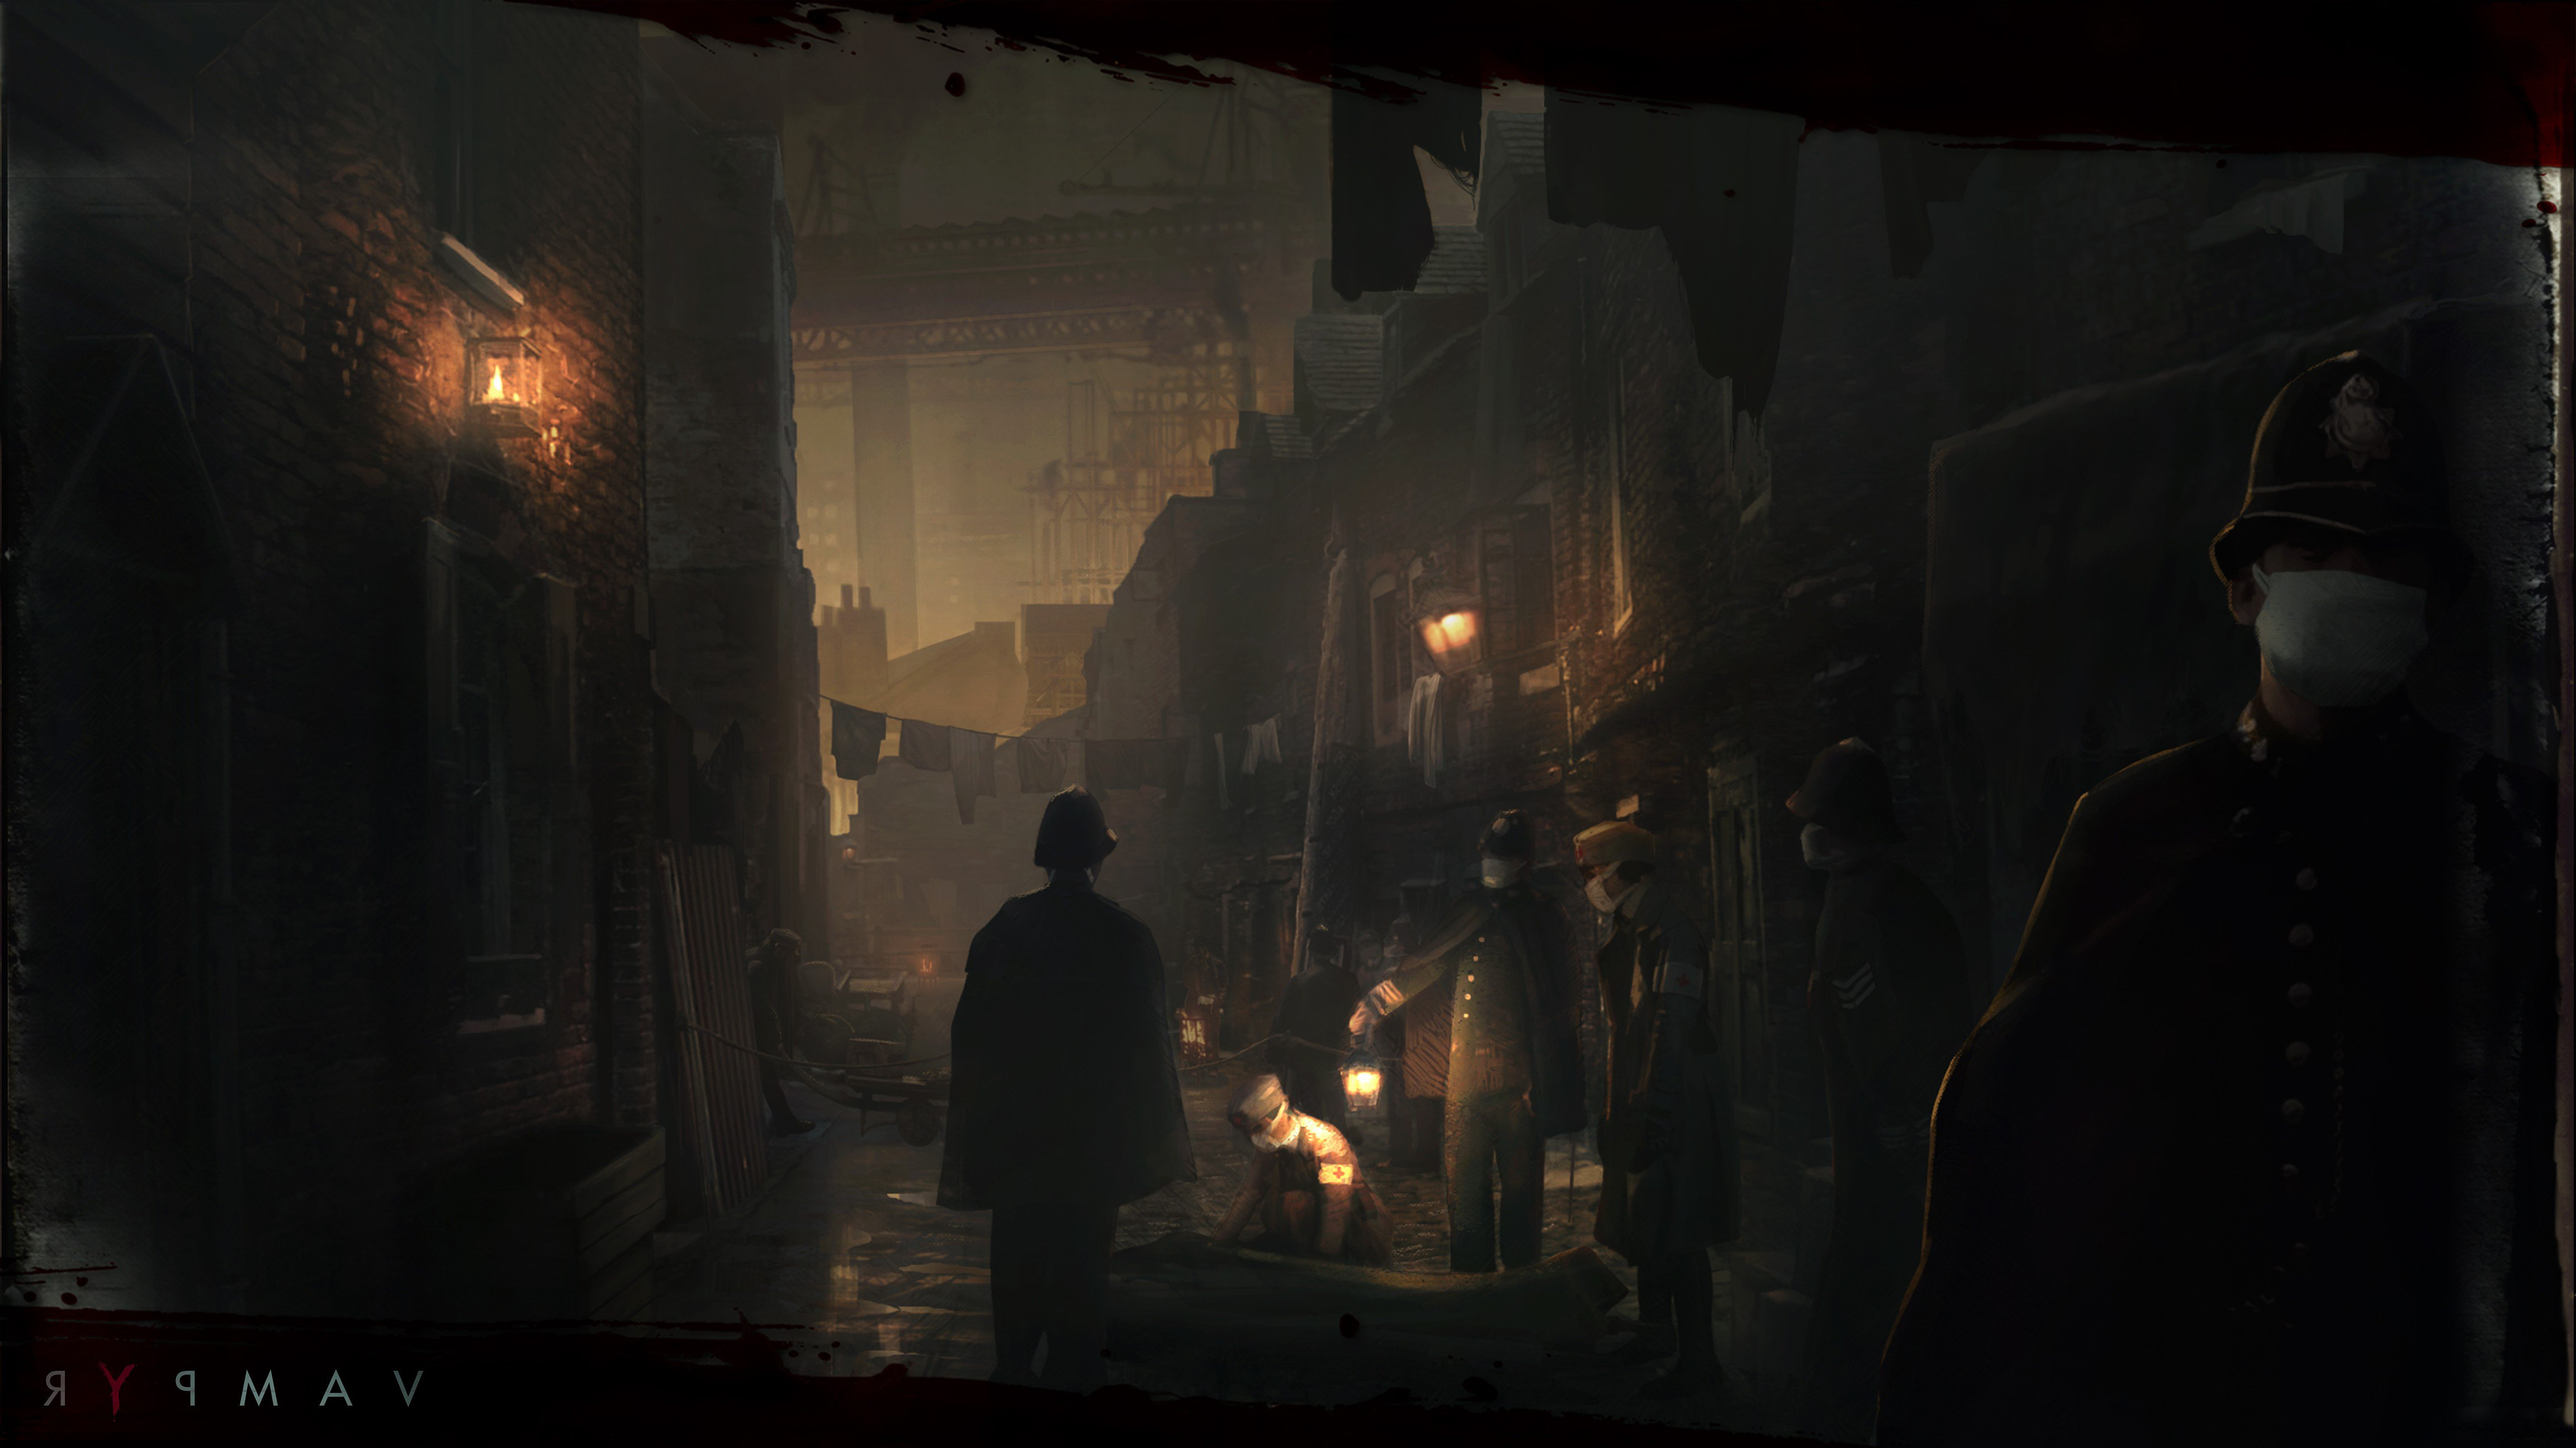 2048x1152 2017 Vampyr Video Game 2048x1152 Resolution HD ...  Video Games 2017 Wallpaper Hd